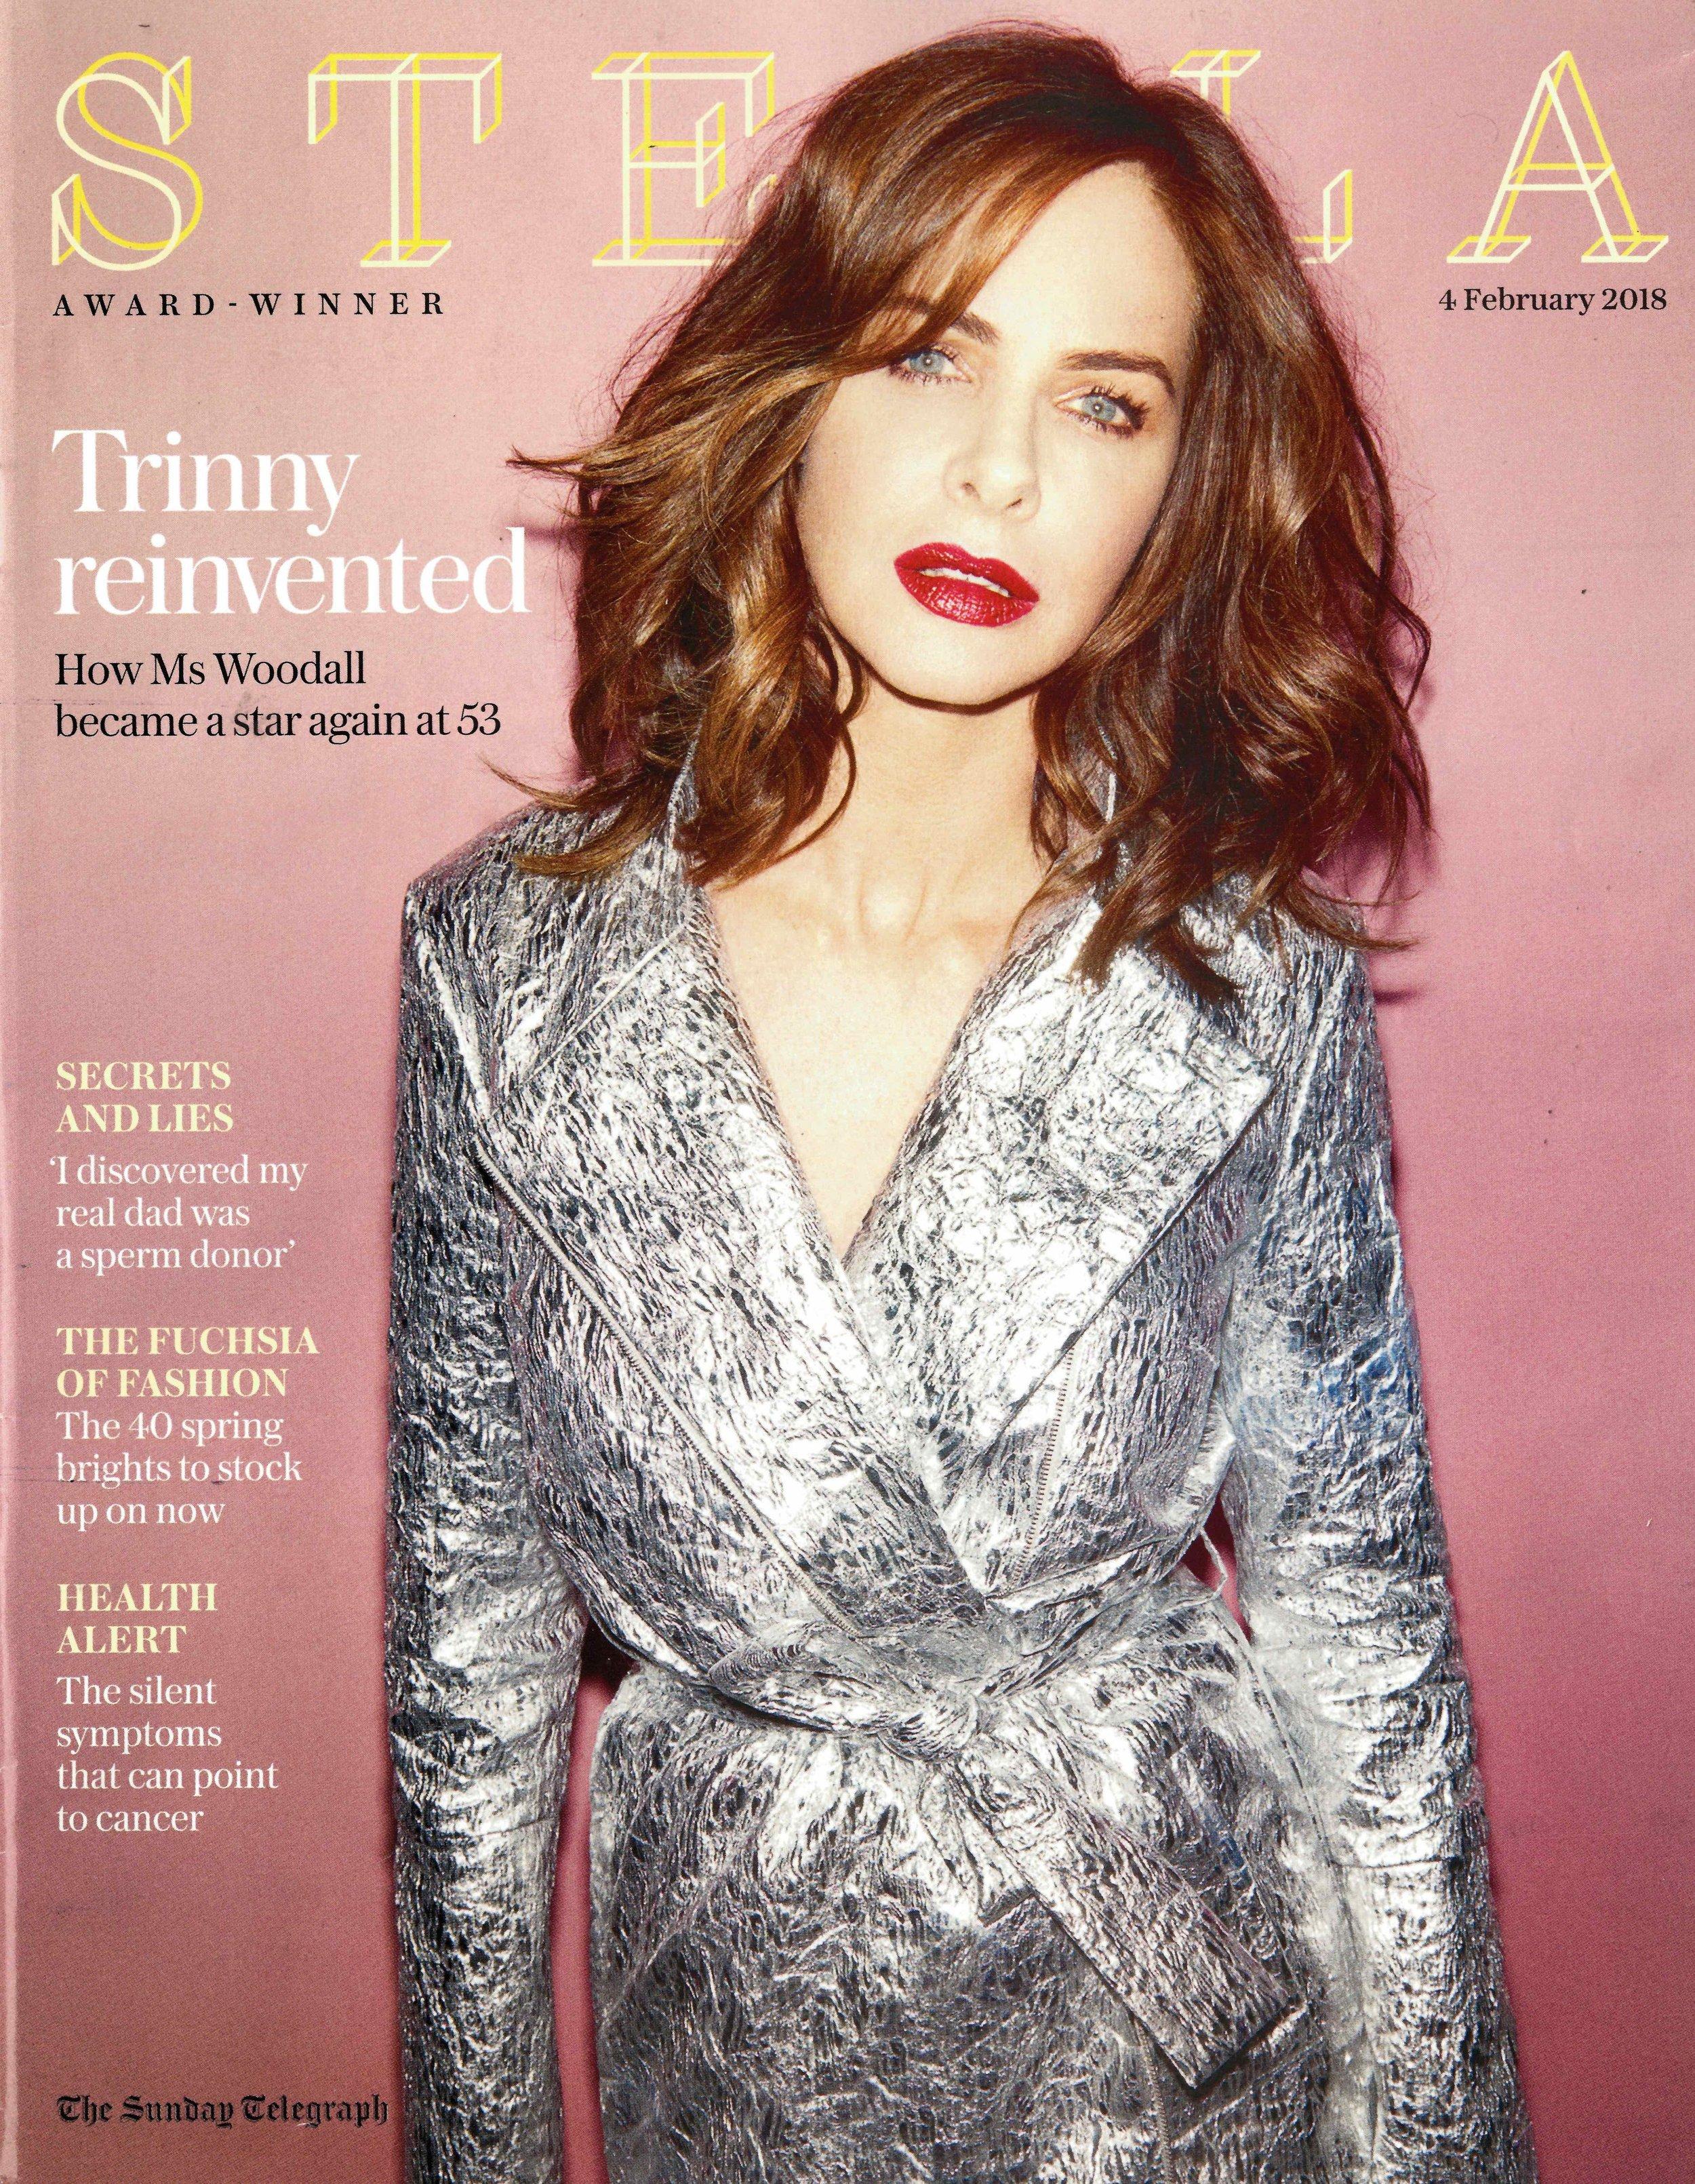 04.02.18 Stella Magazine Cover - 1 (1).jpg